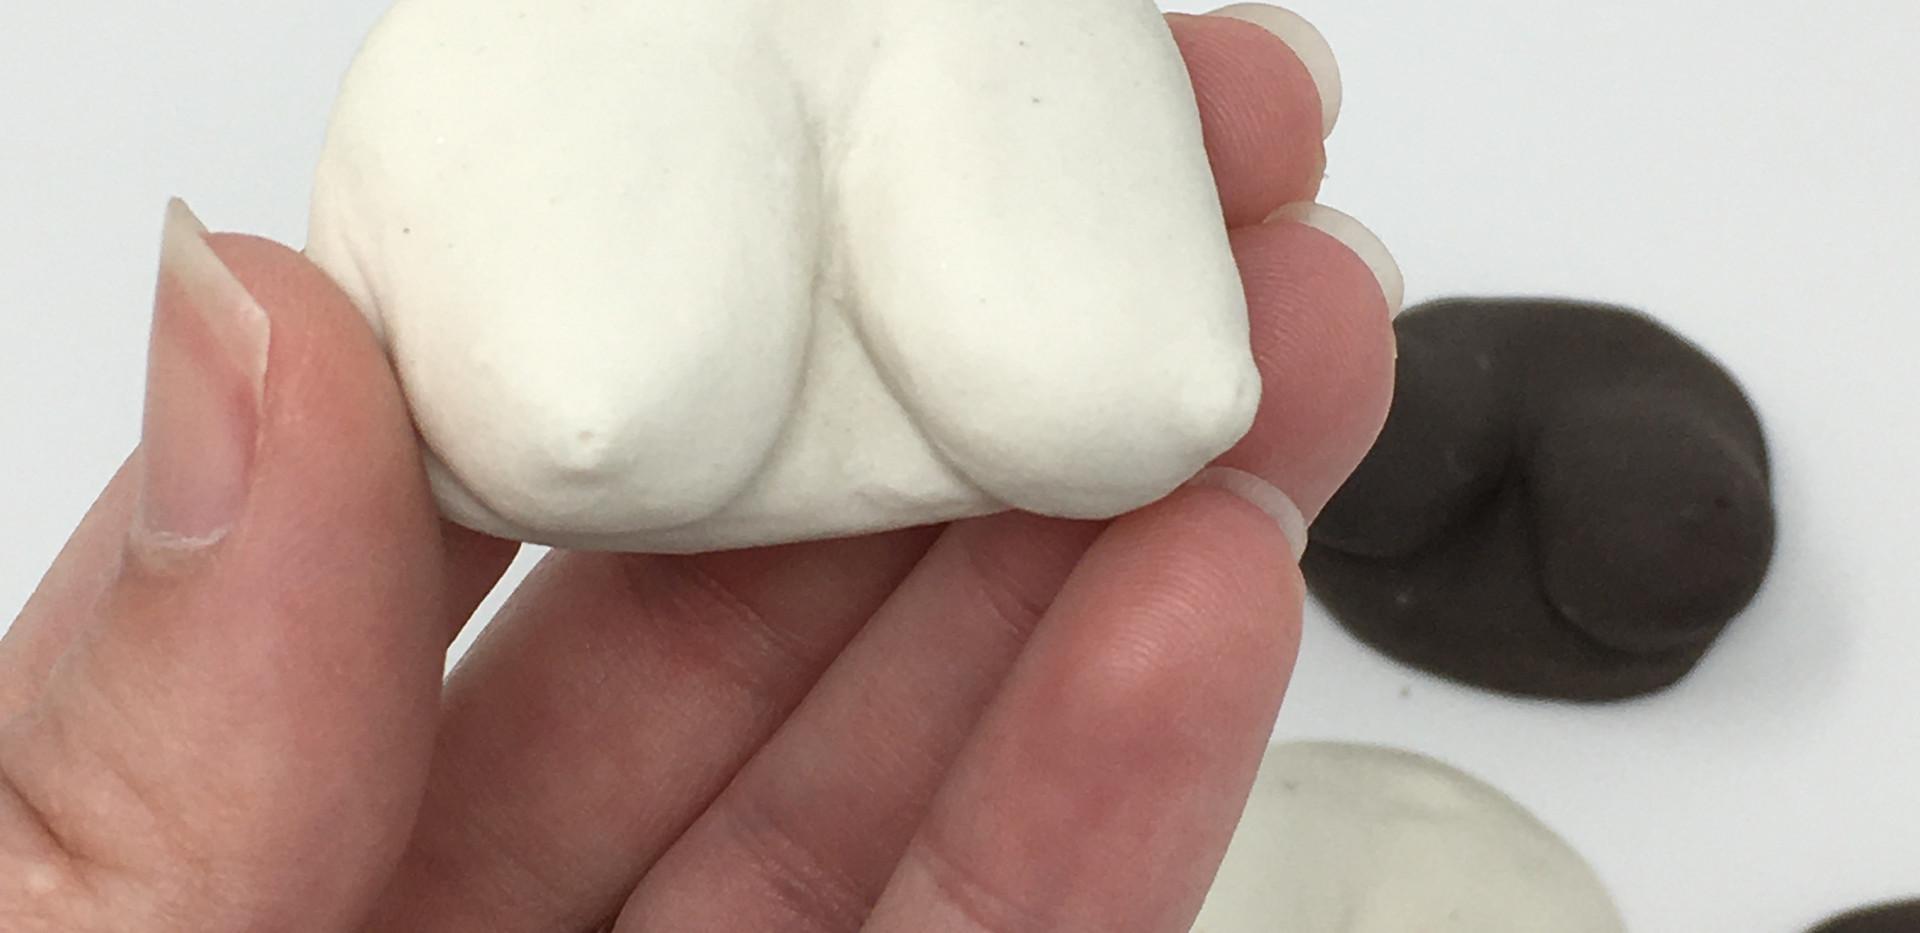 Porcelain Ceramic Boobs